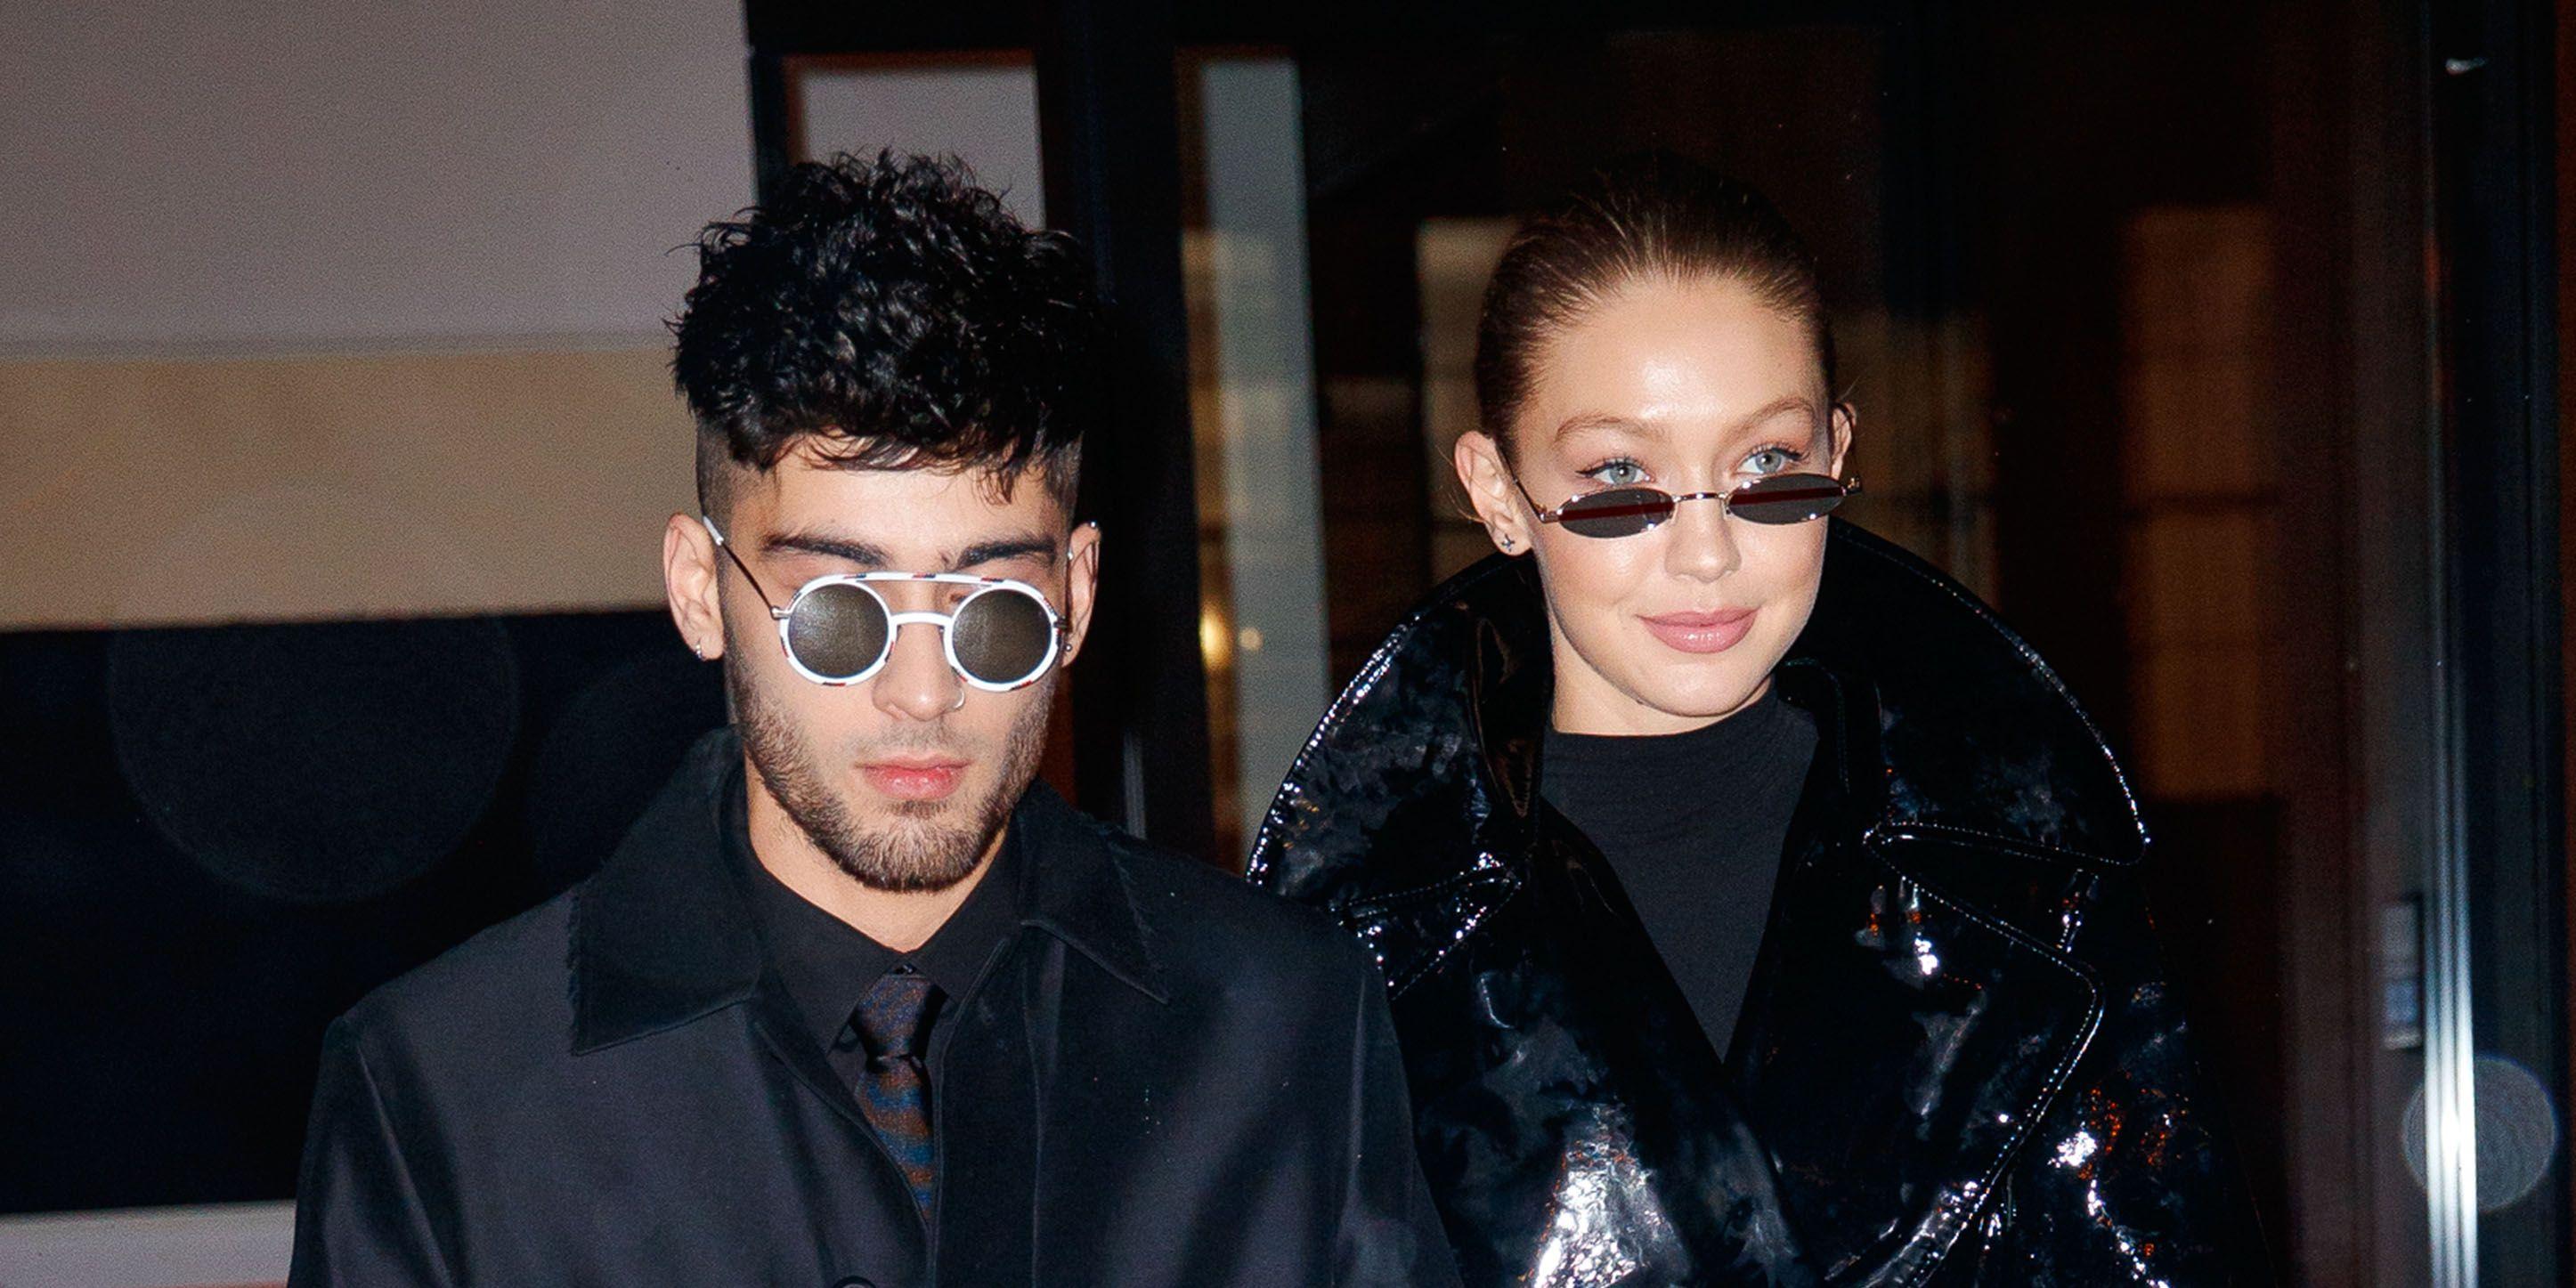 Gigi Hadid en Zayn Malik uitelkaar